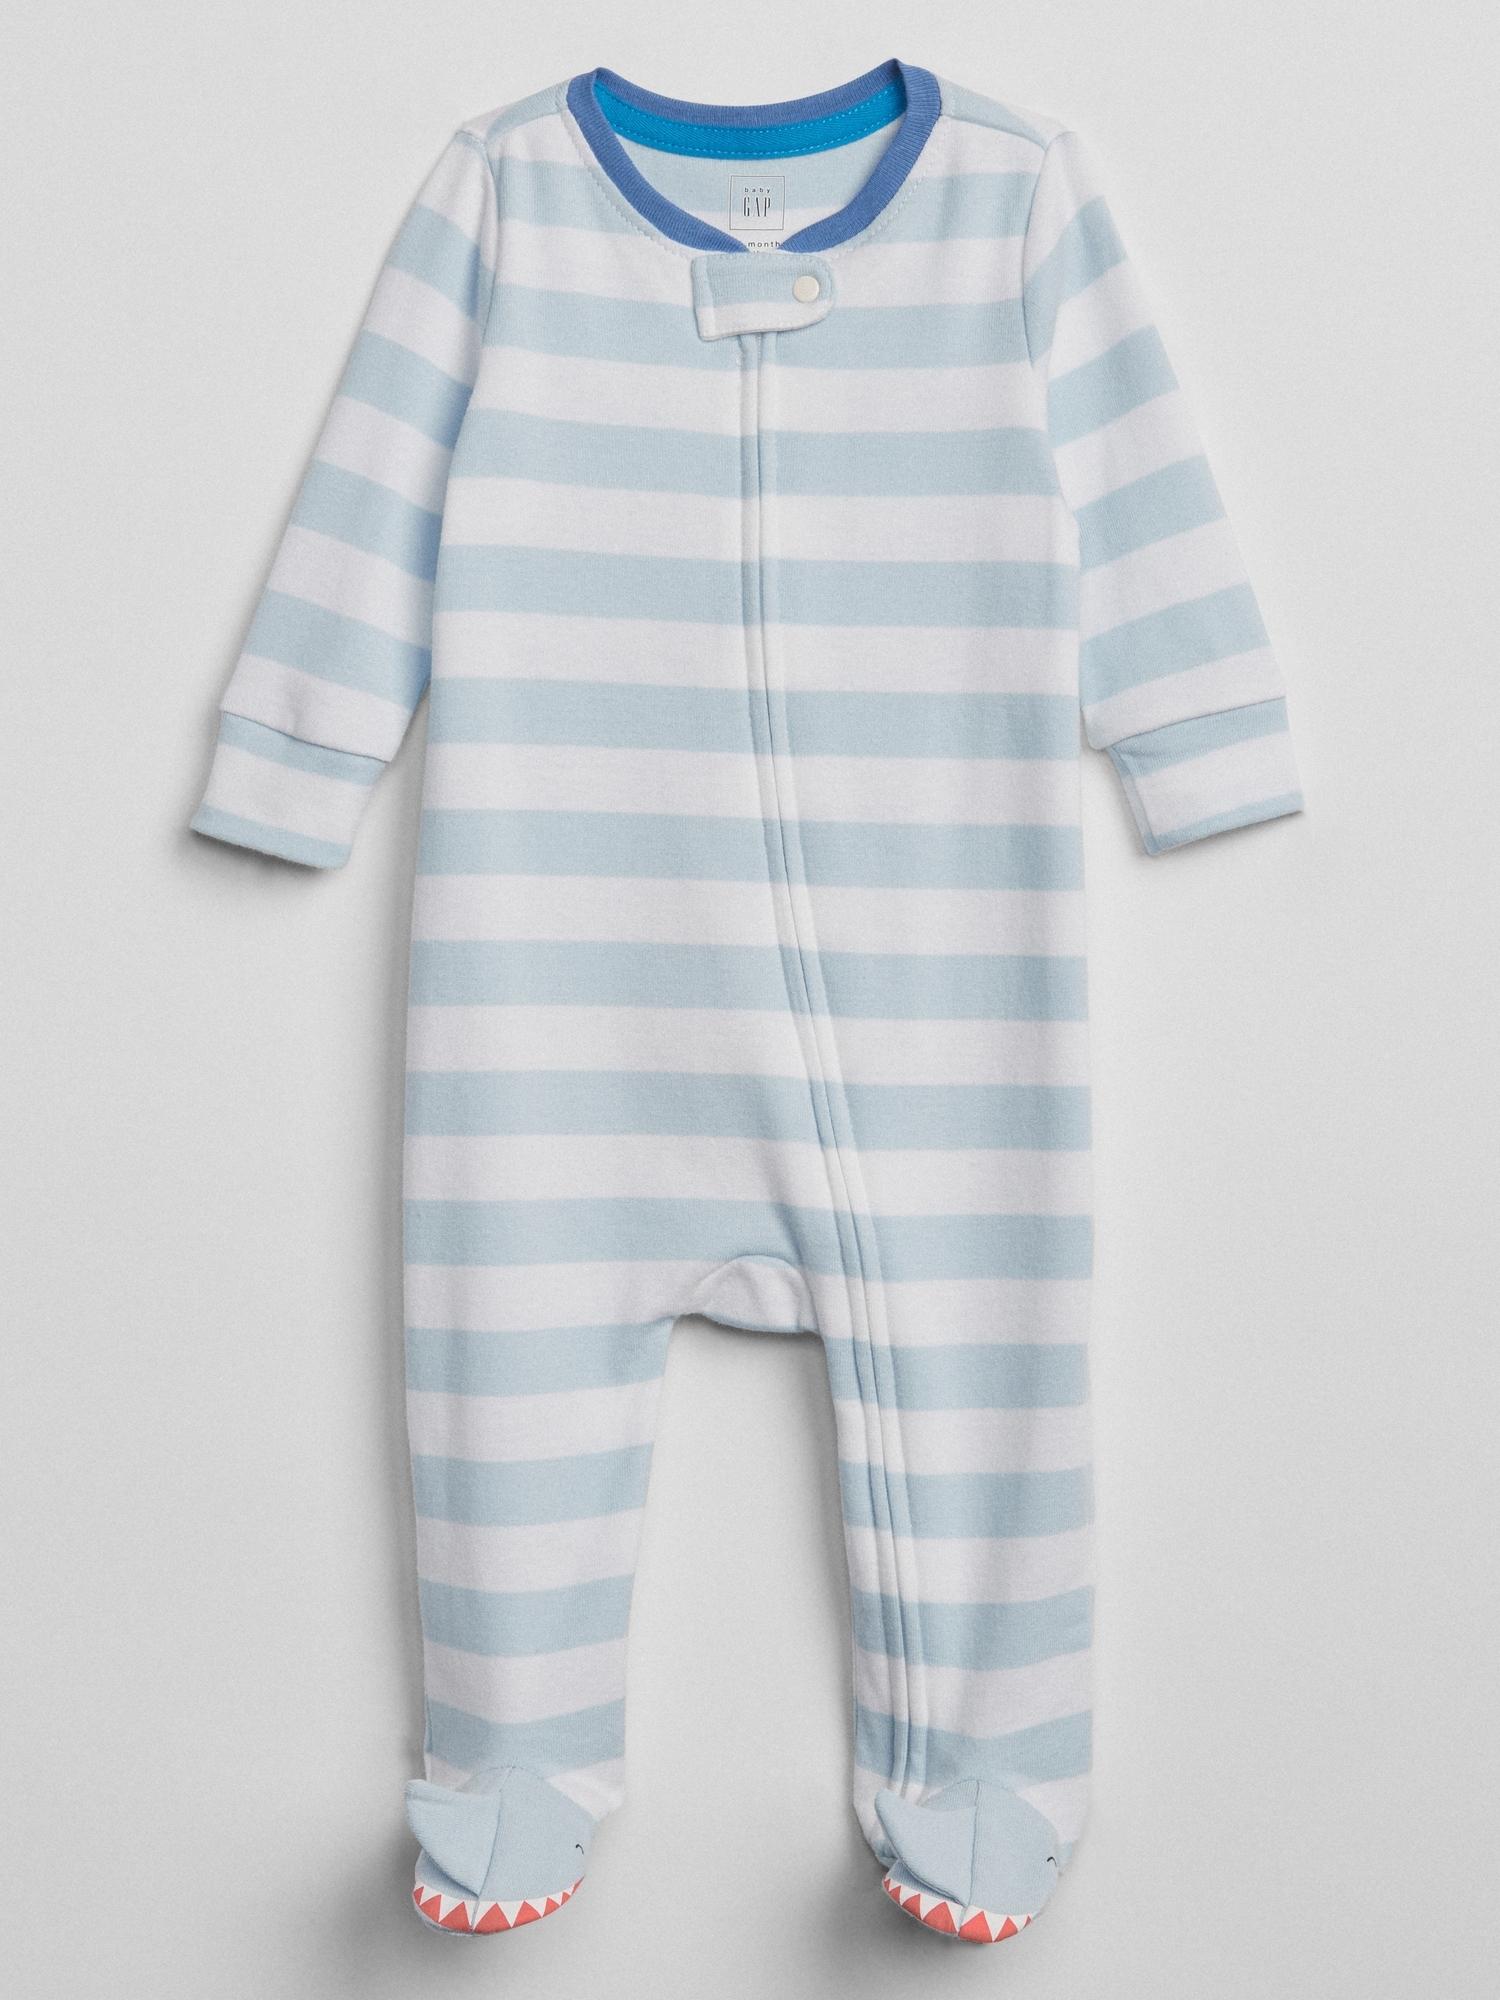 boys s sleepers pajamas product sleeper moose months carter carters fleece piece one baby